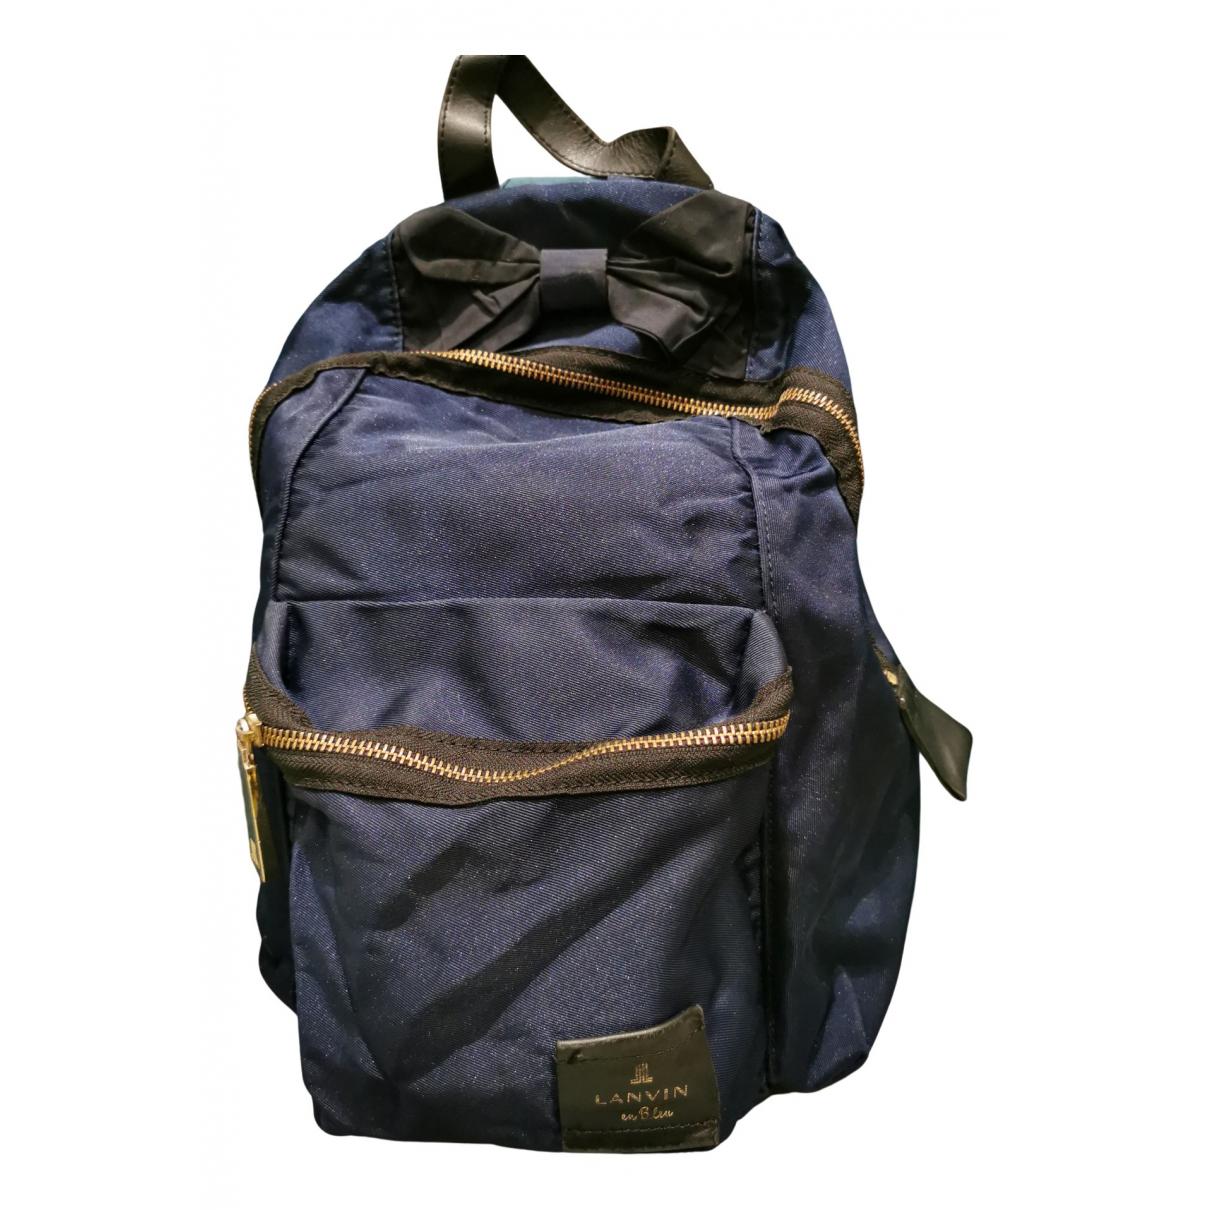 Lanvin N Navy backpack for Women N